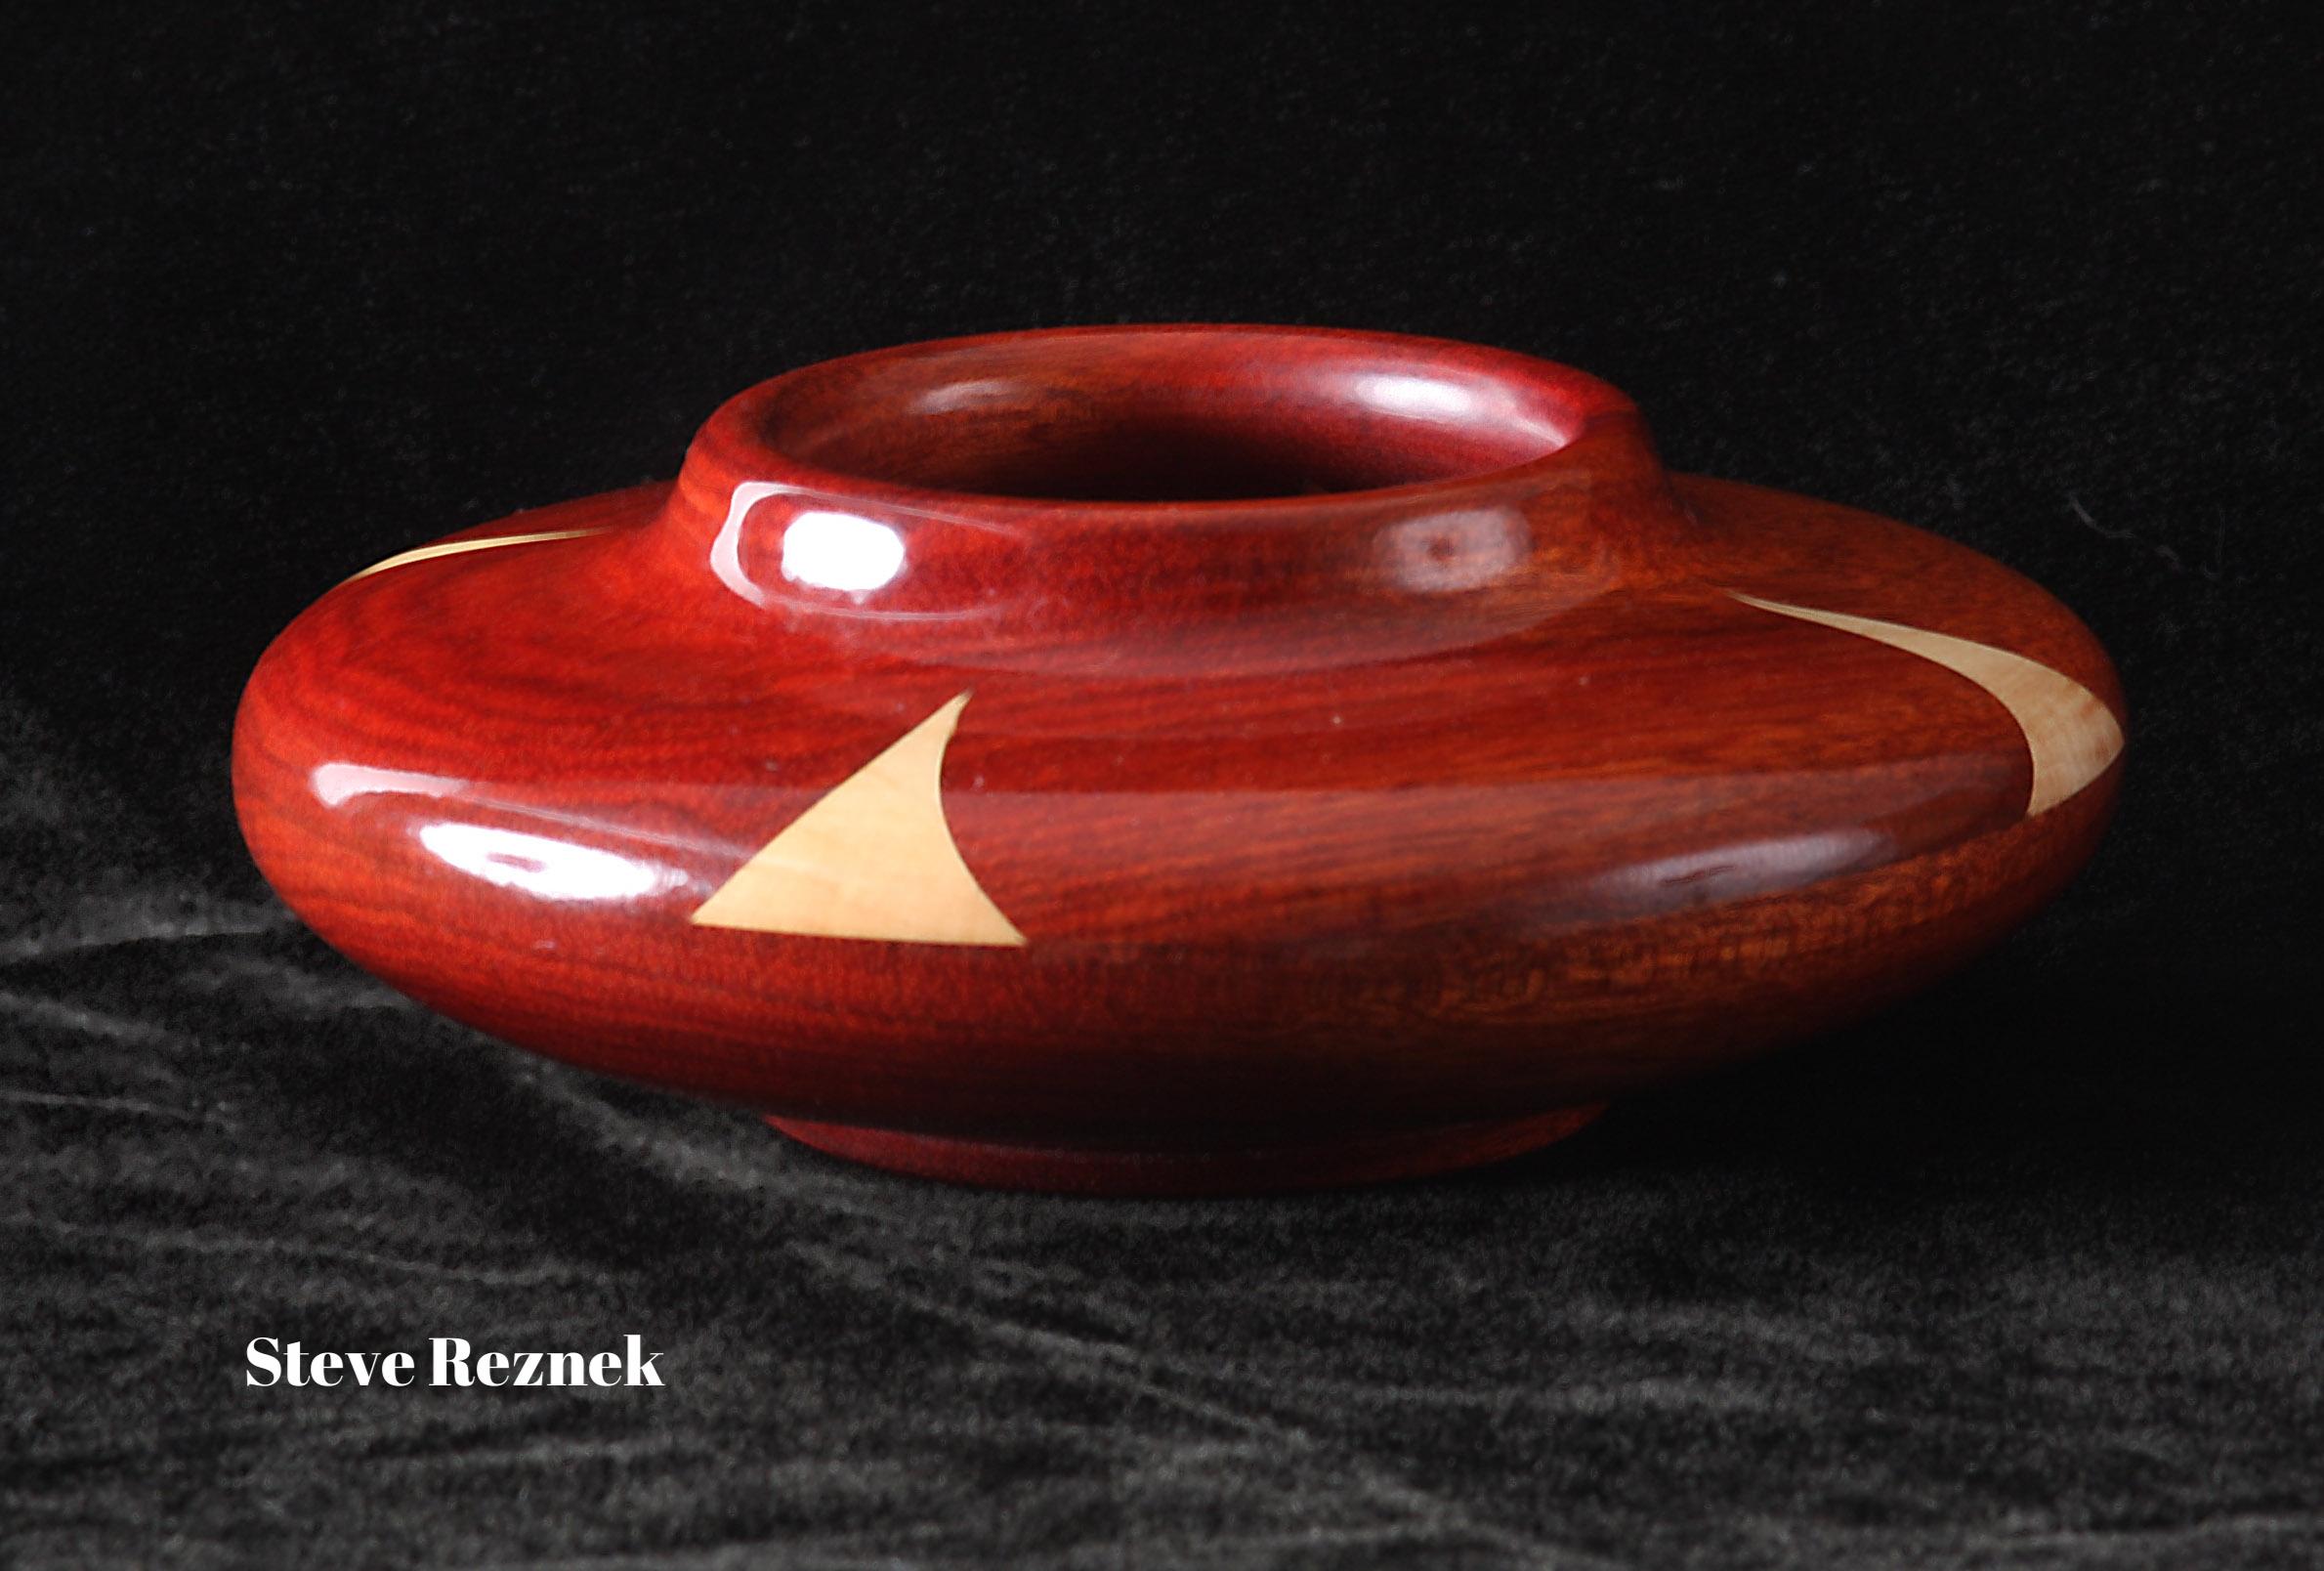 Steve Reznik bowl2.jpg